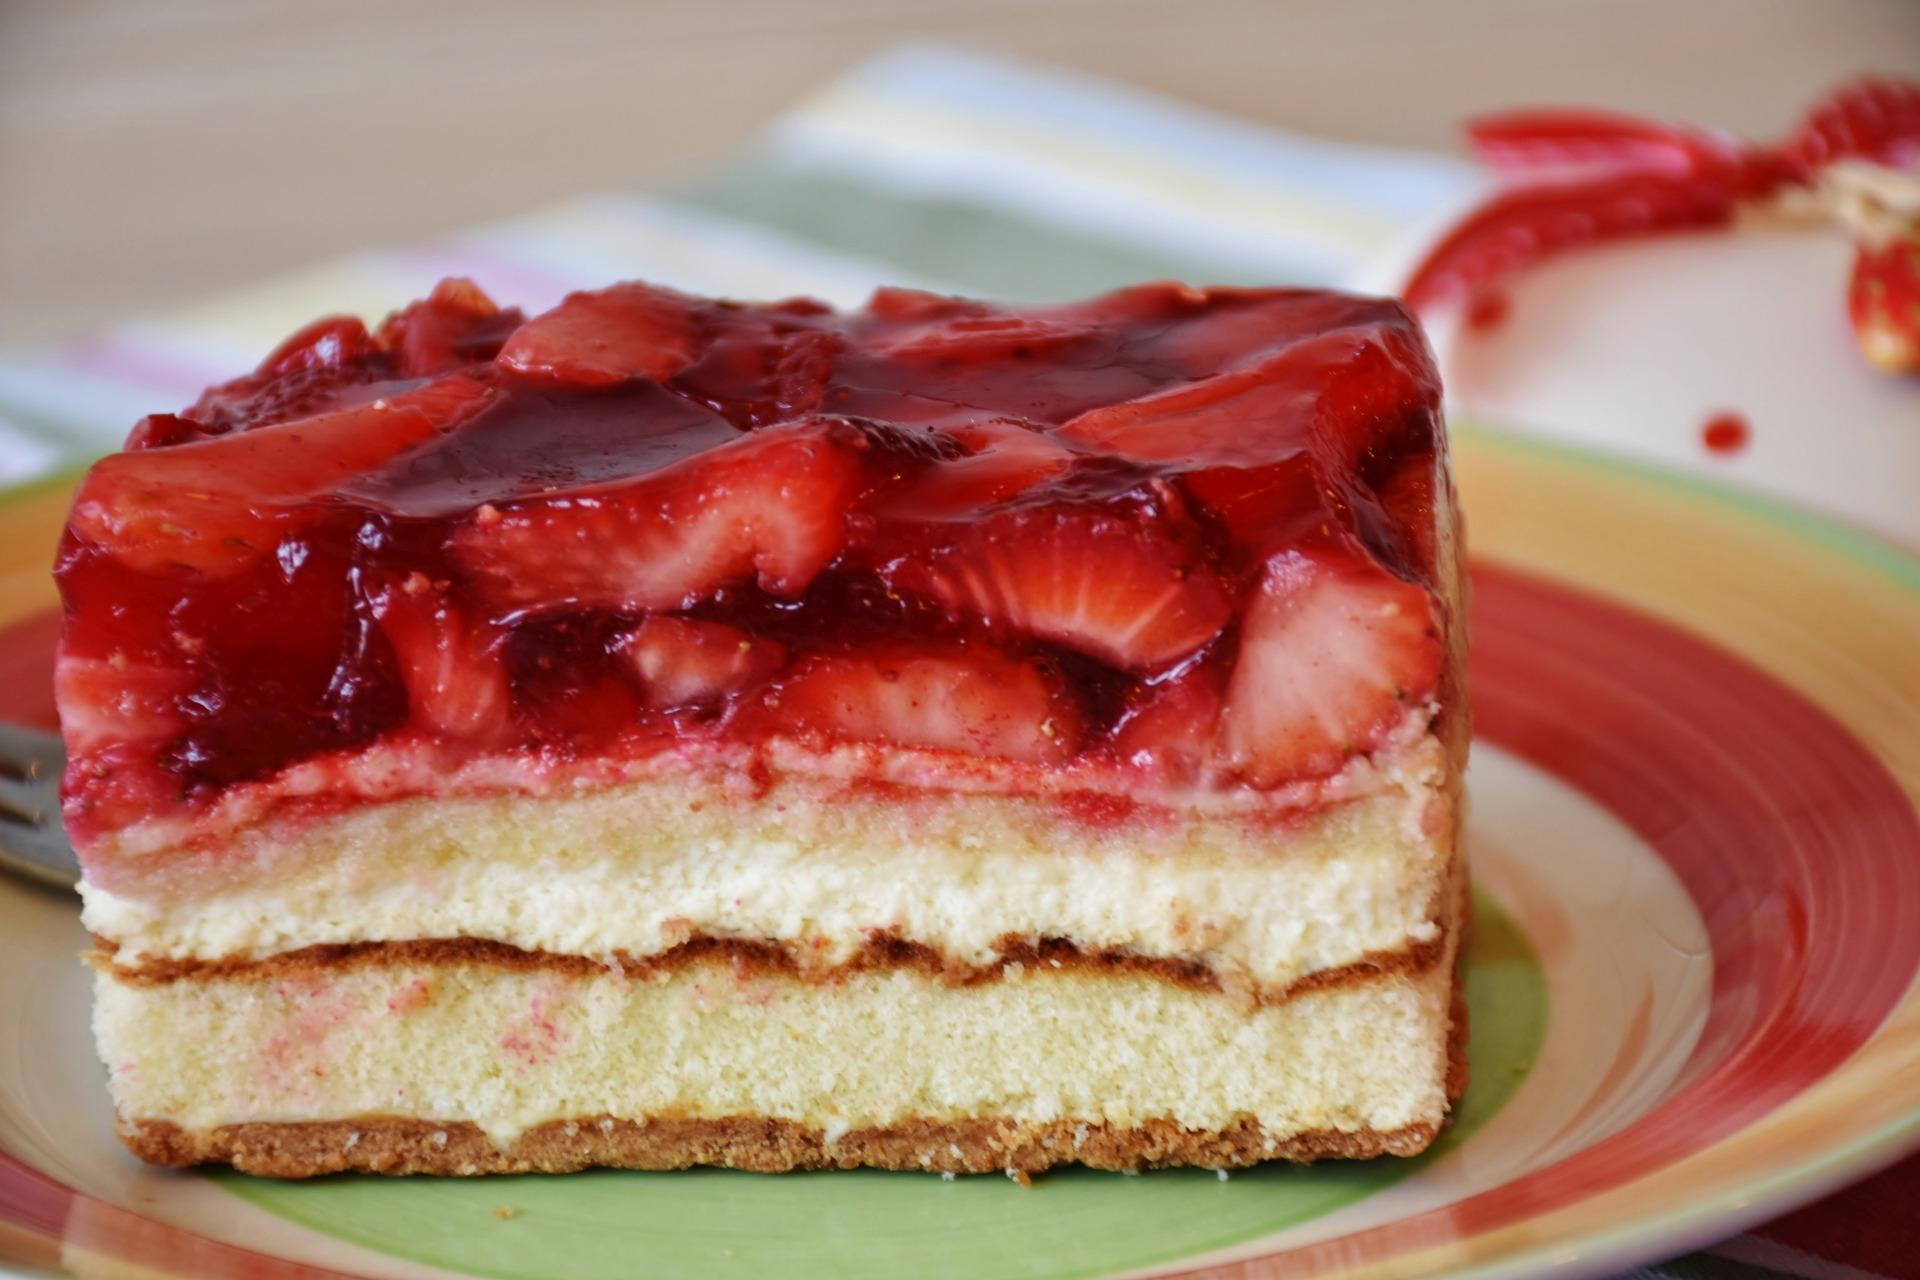 Enjoy Some Strawberry Vanilla Cheesecake